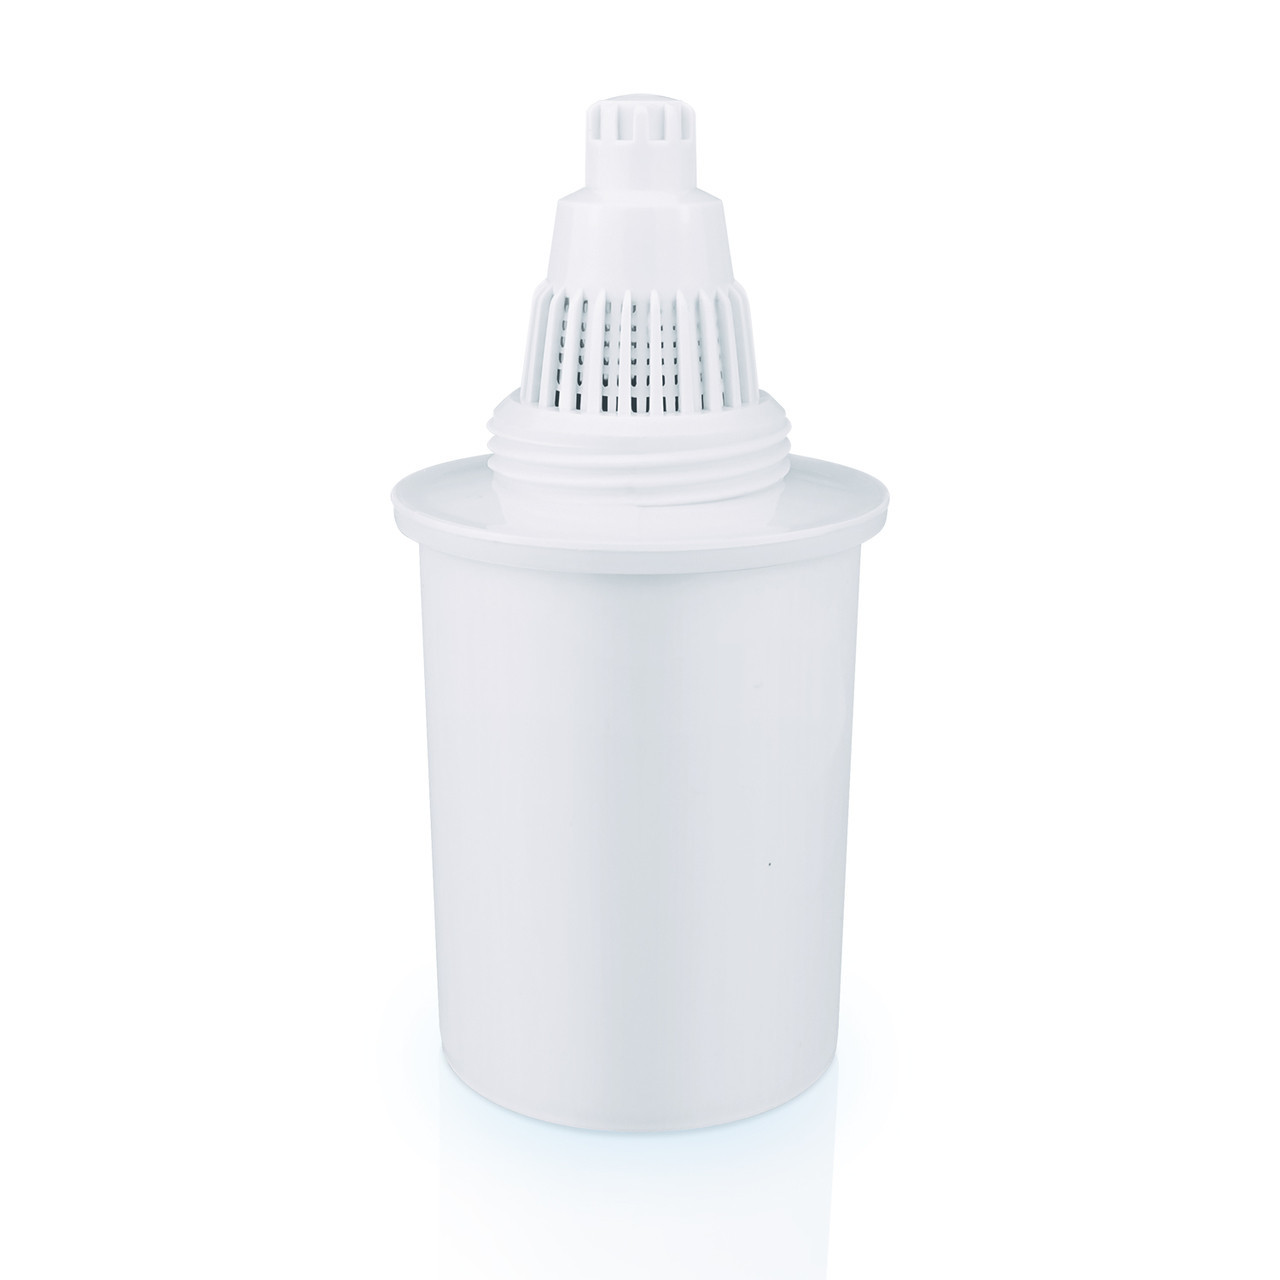 Filtr do dzbanków Wessper Aquapro Alkaline 300l biały